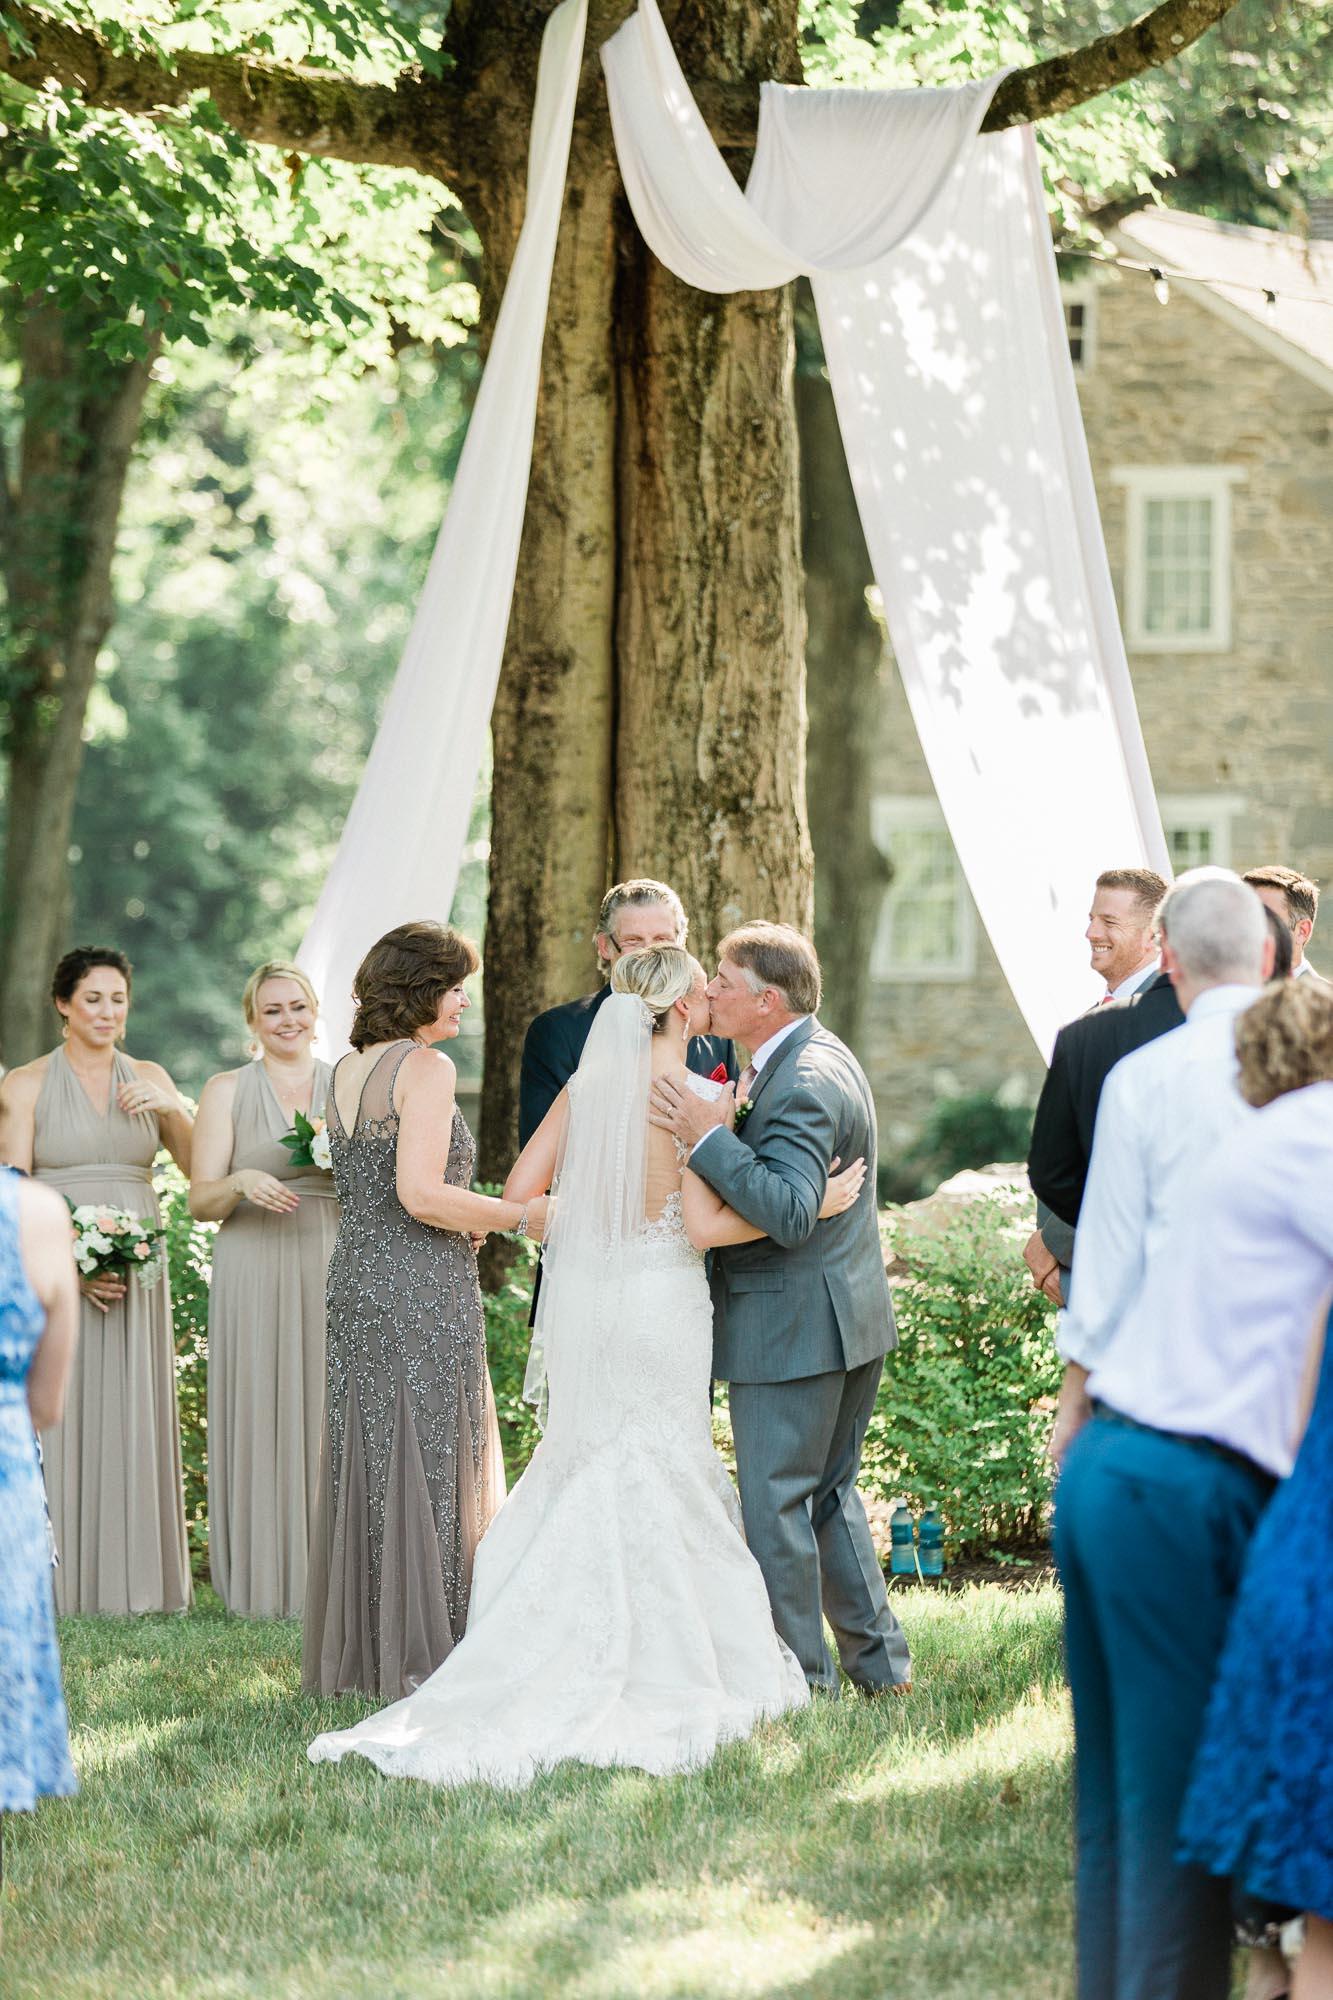 Allenberry-resort-historic-pennsylvania-wedding-21914.jpg